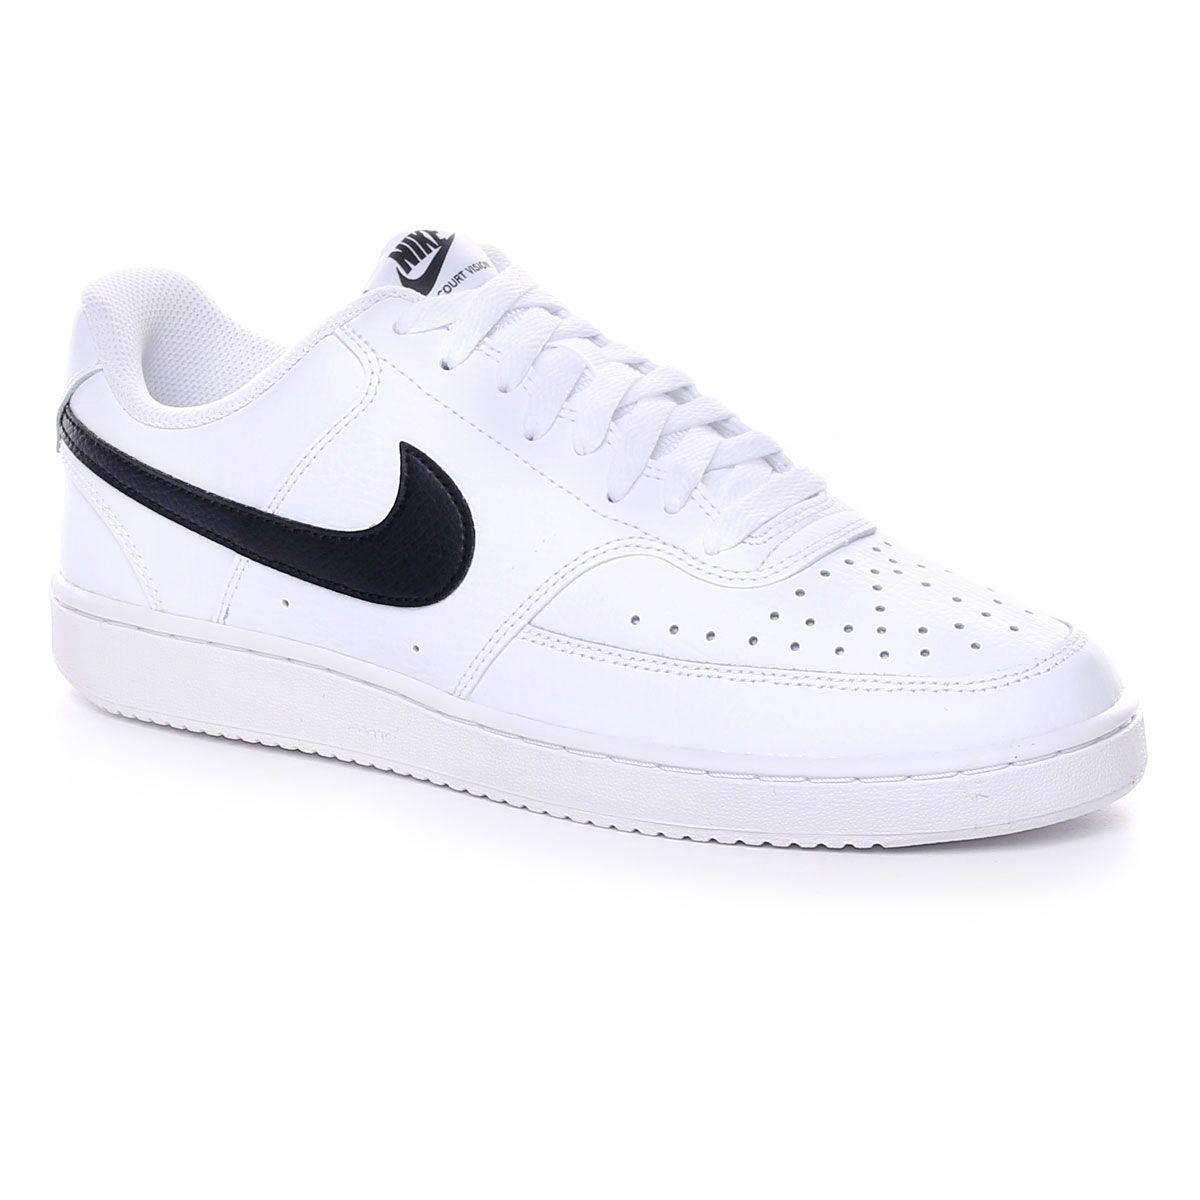 Nike Court Vision Low Bianco Nero